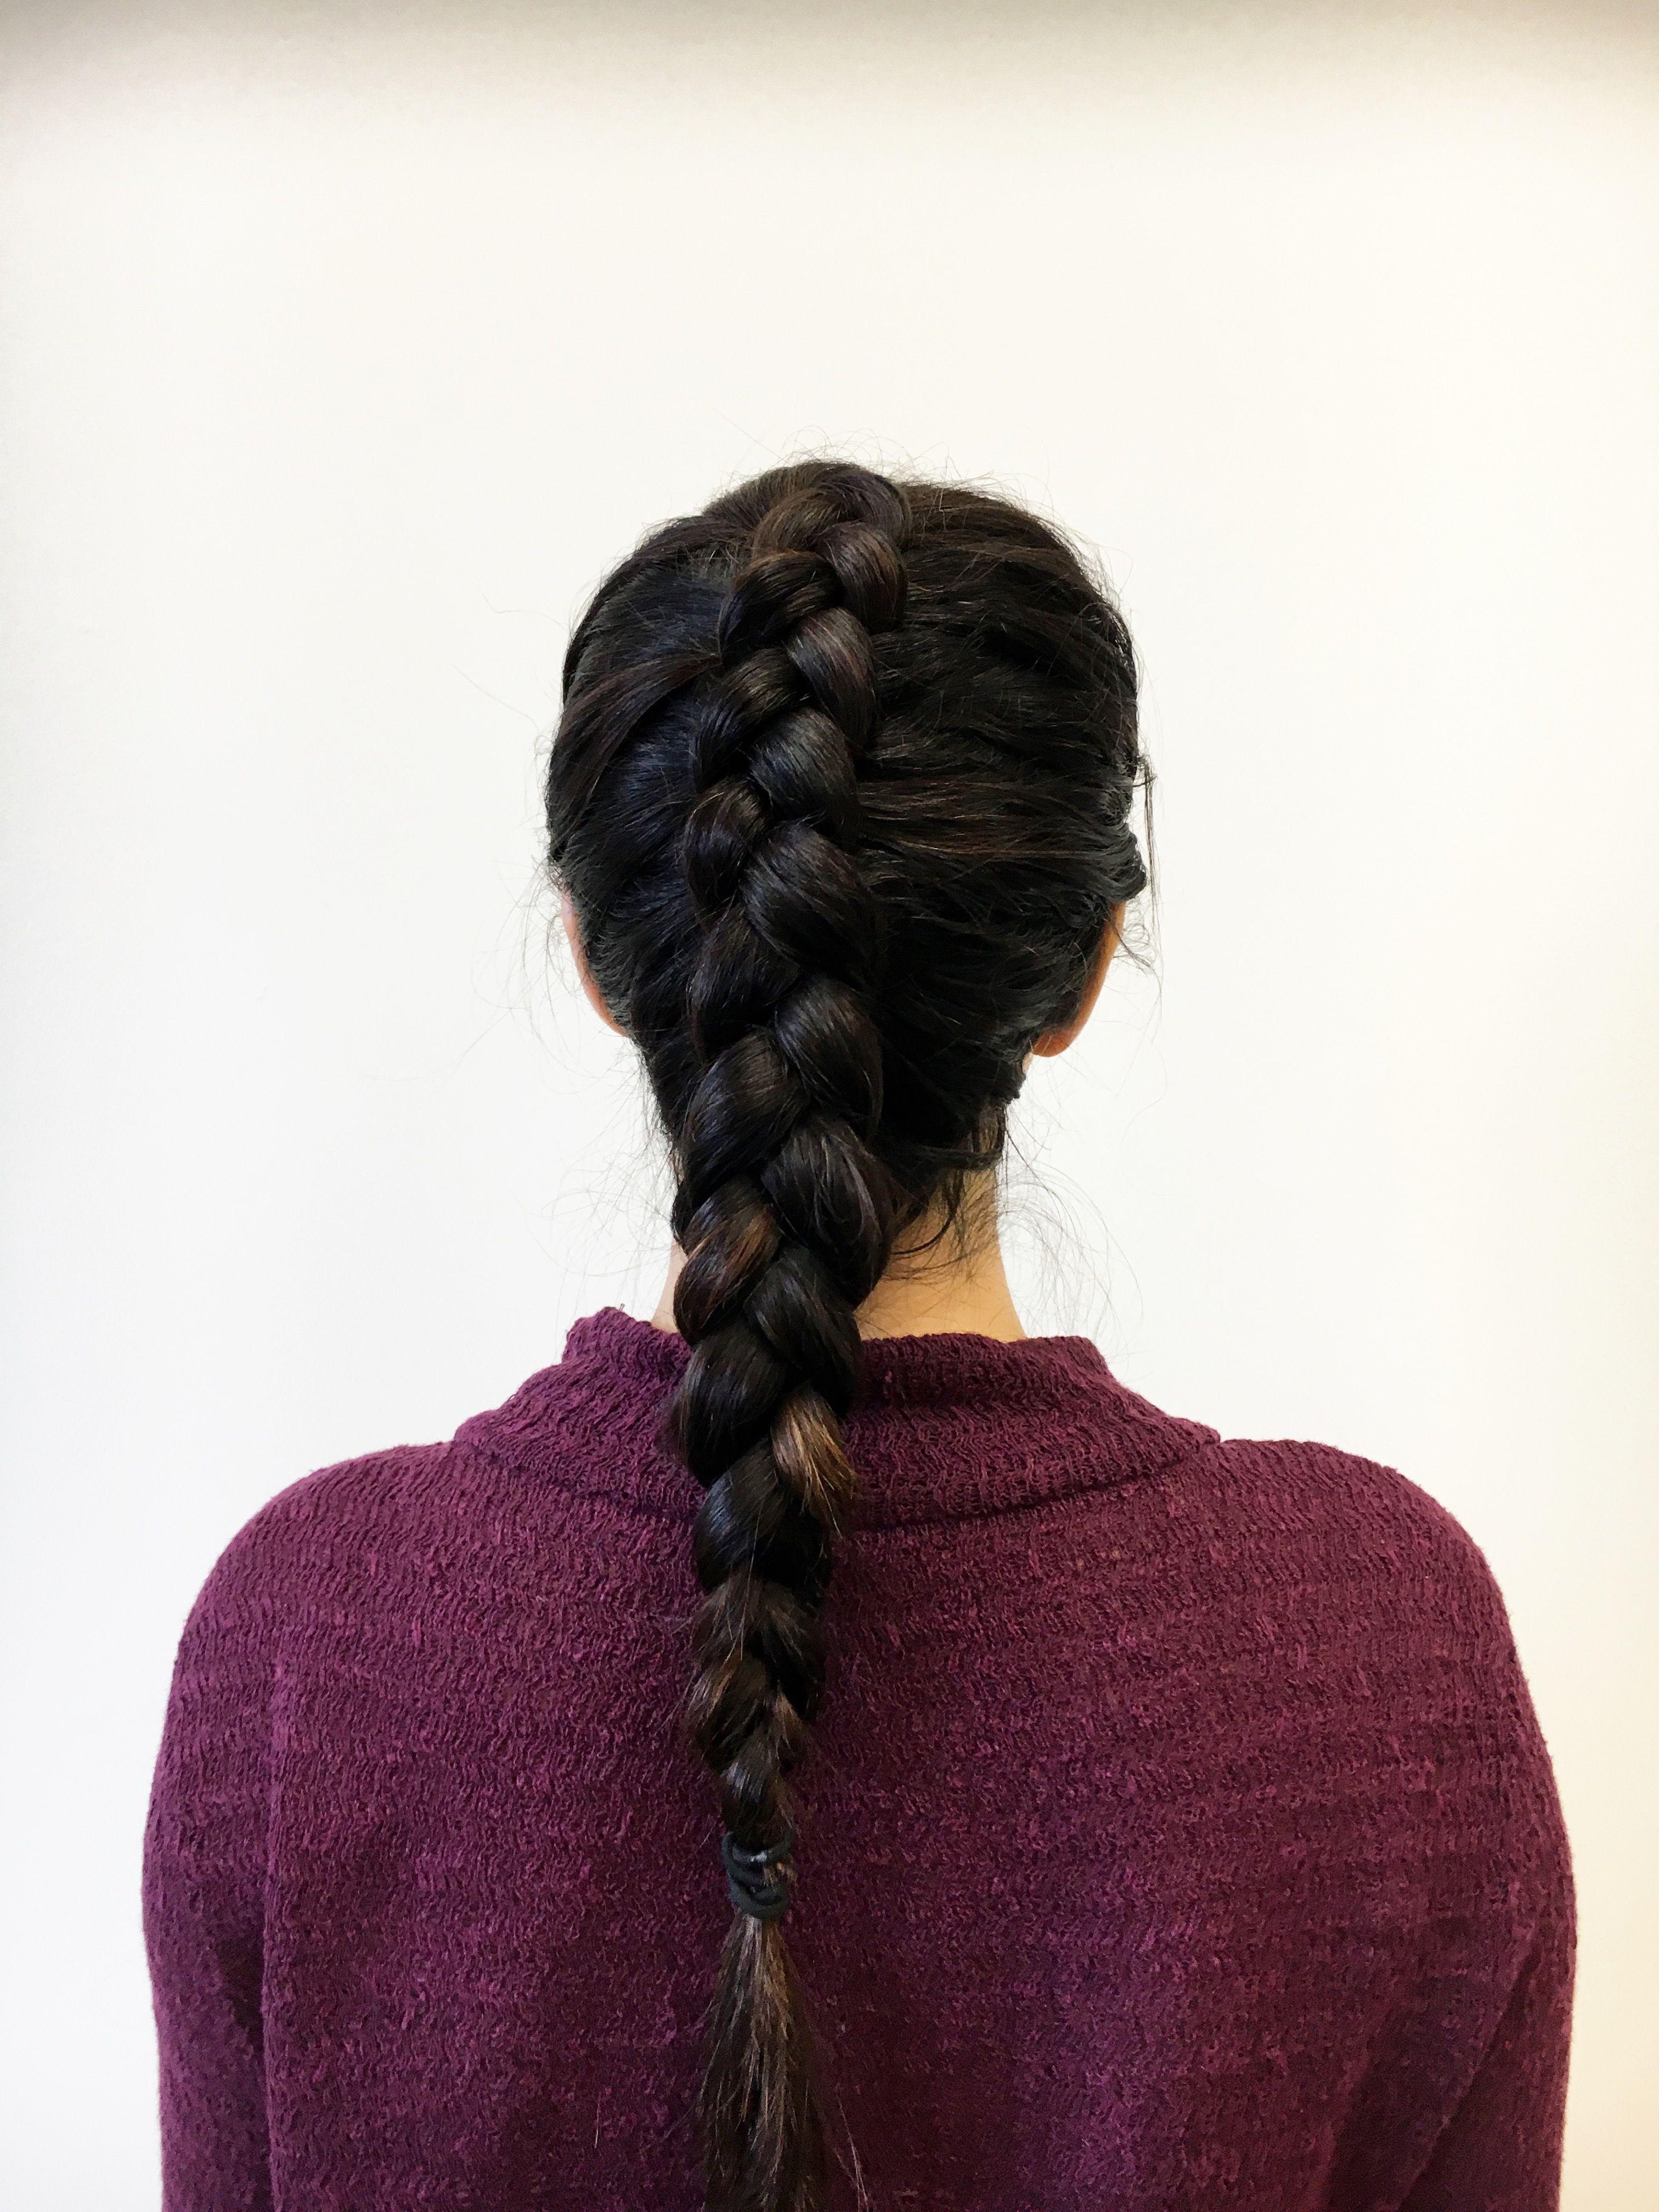 Pin By Lunch Break Hair On Lunch Break Braid Hair Styles Her Hair Hair Wrap